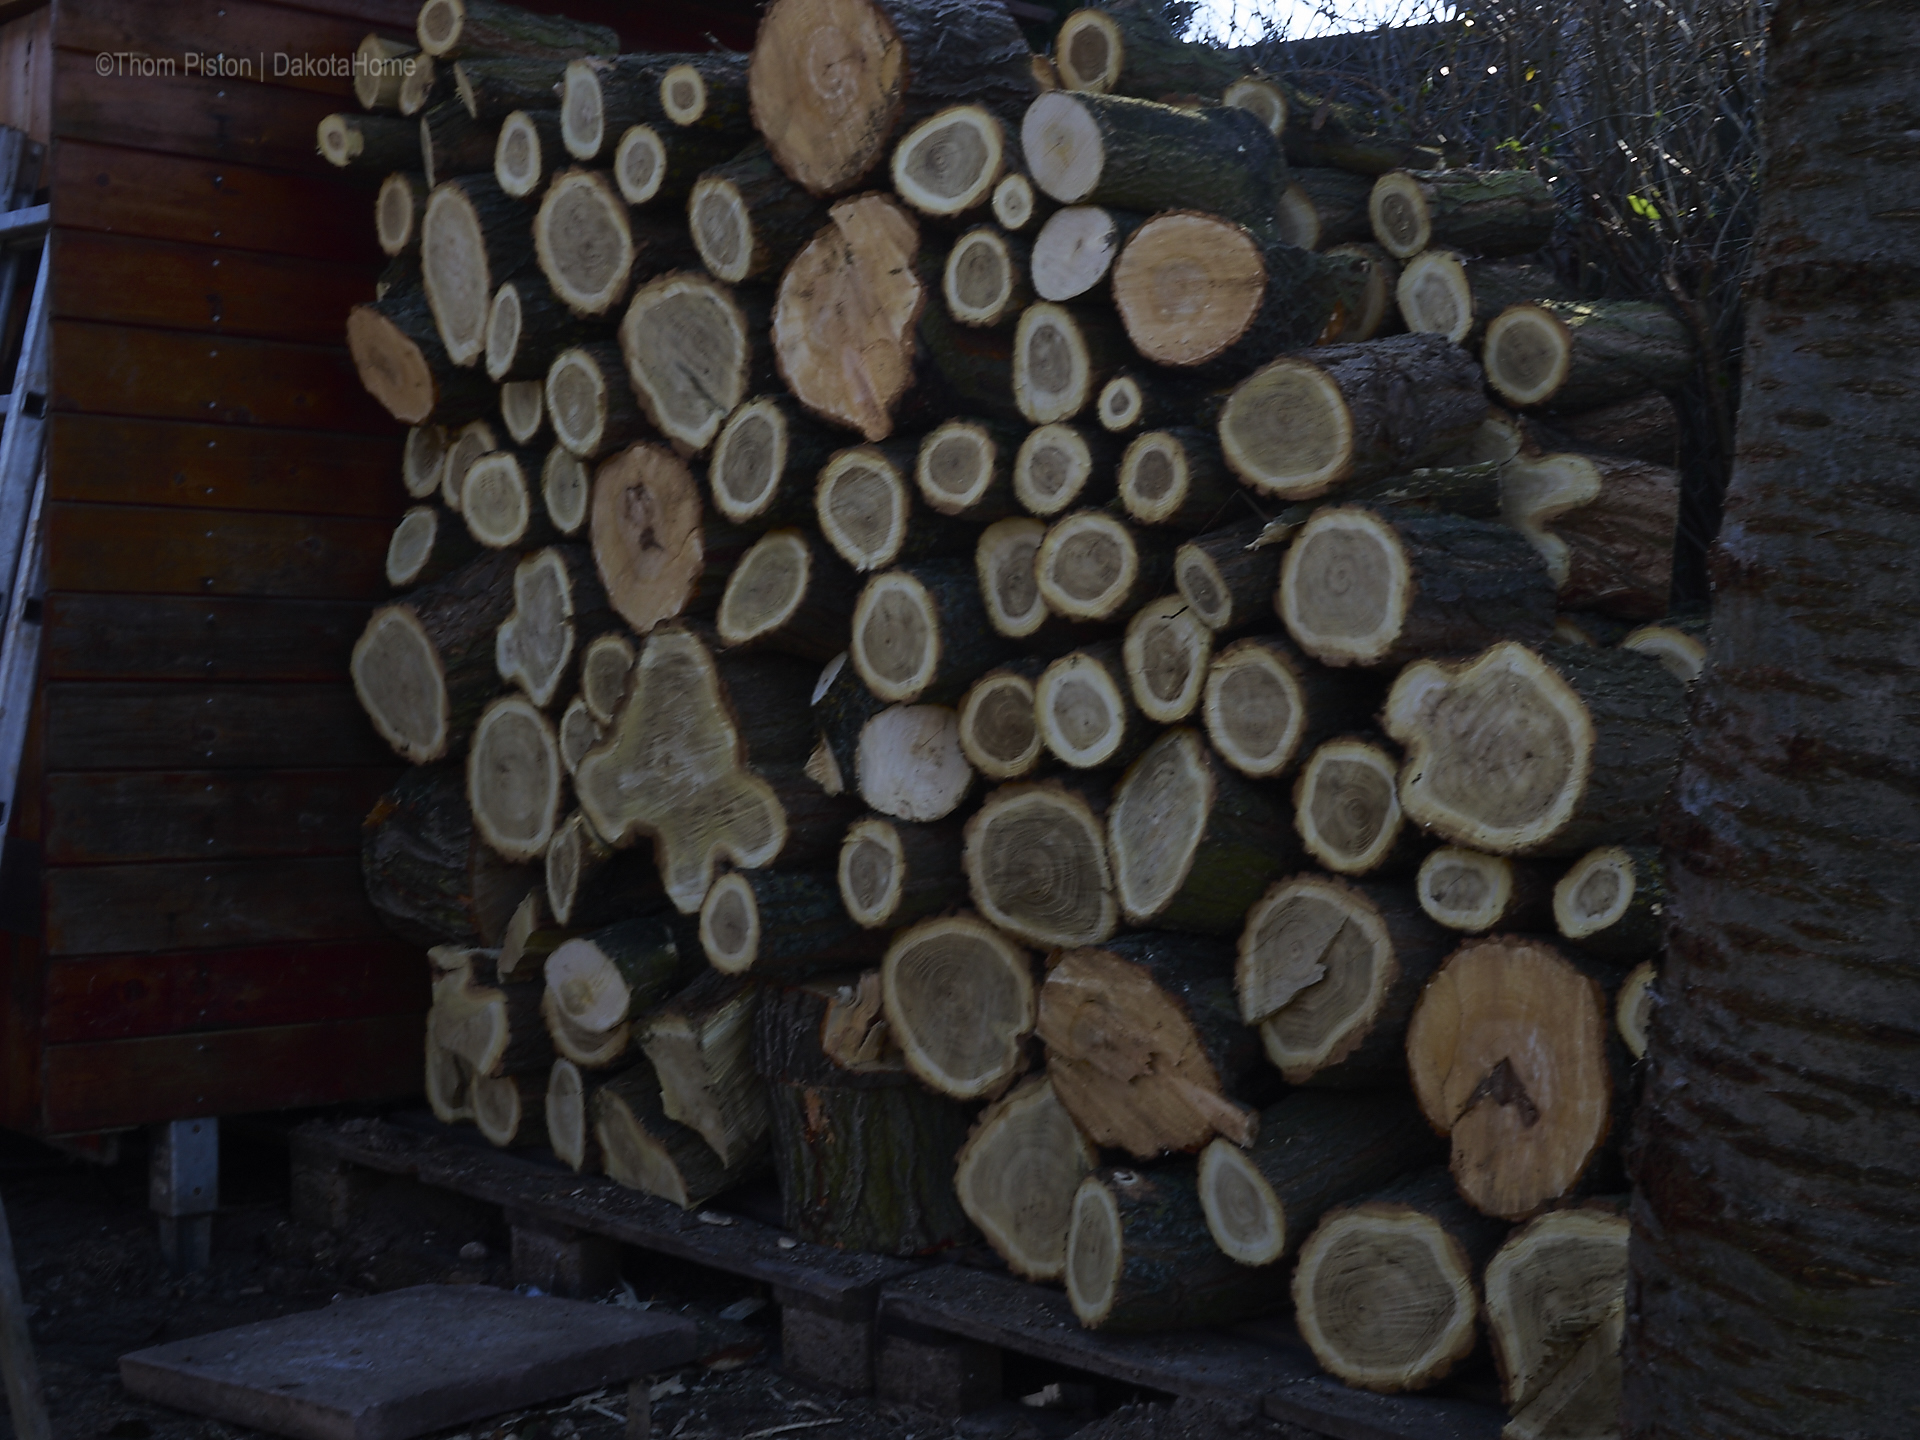 Holz at Dakota Home